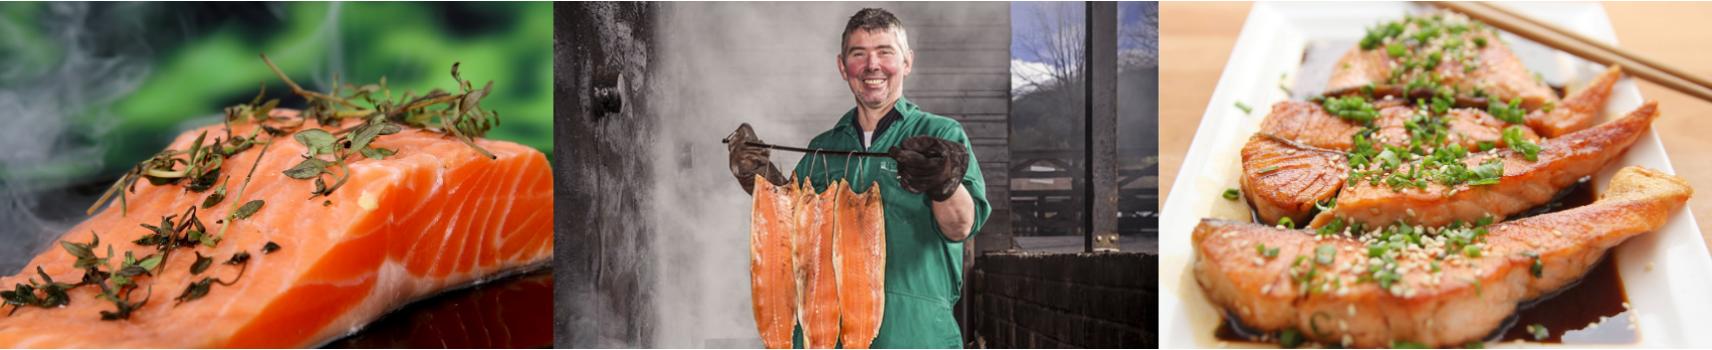 Smoked Fish Salmon & Mackerel